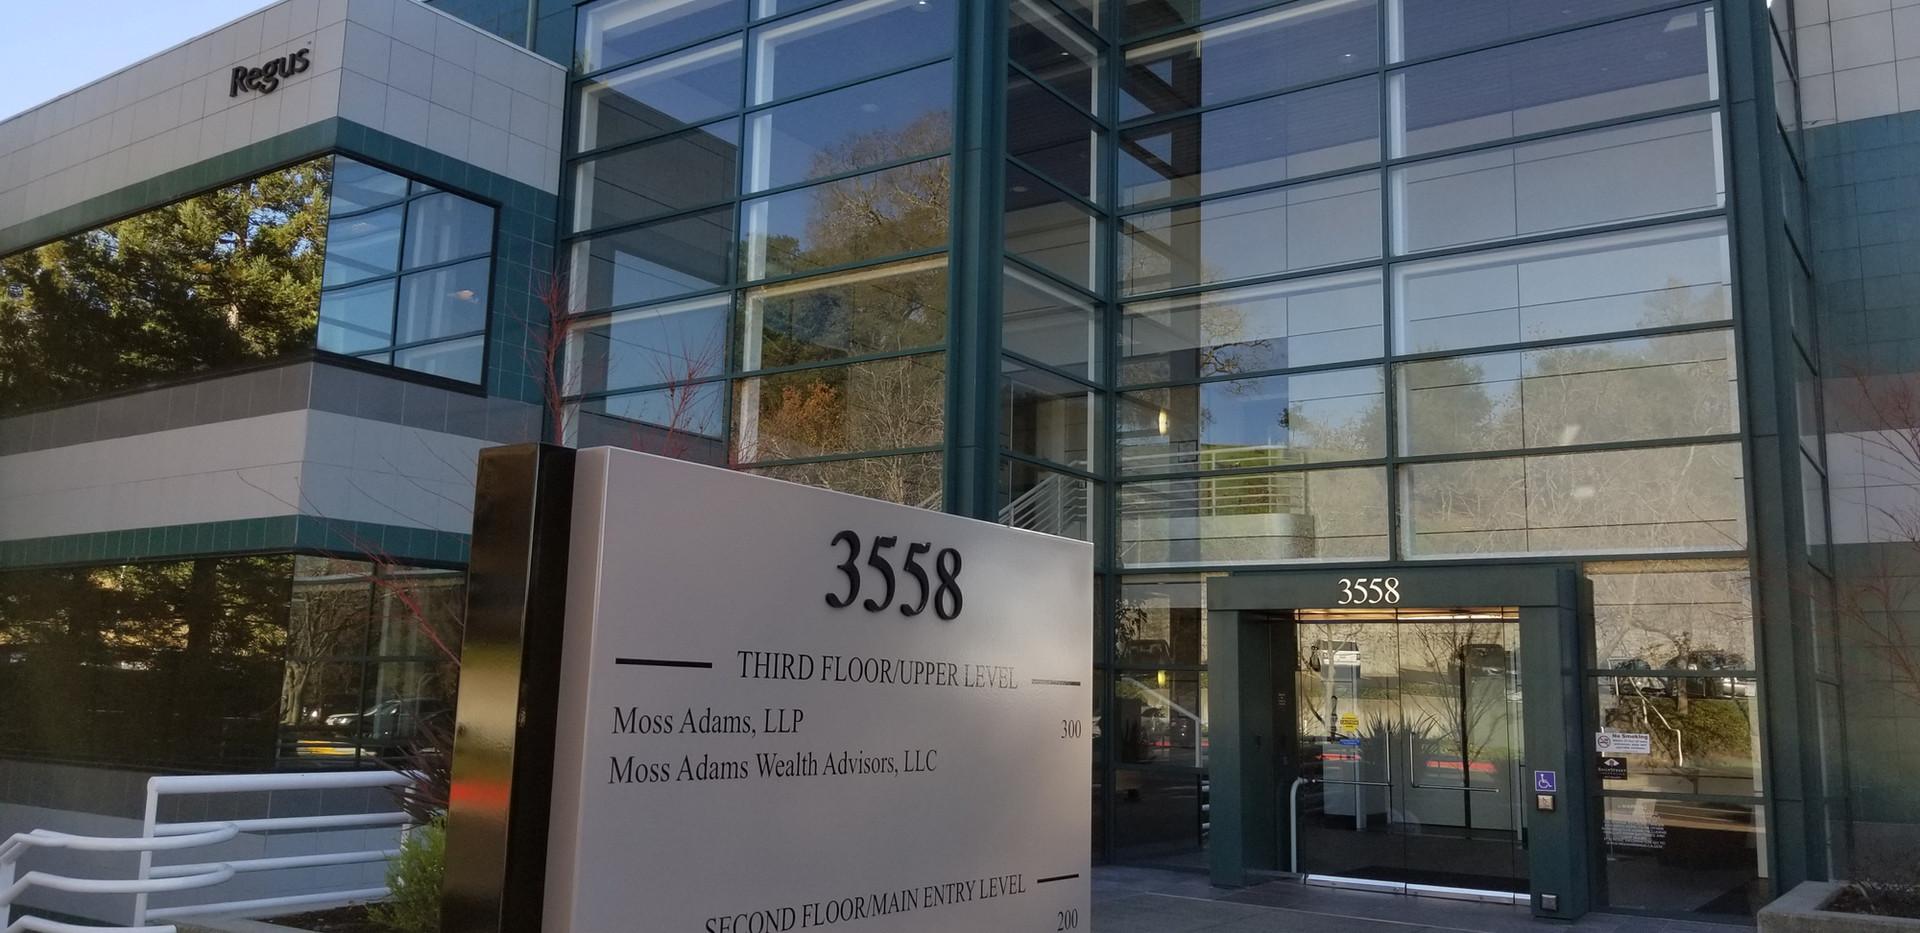 My Regus Office in Santa Rosa, CA.jpg